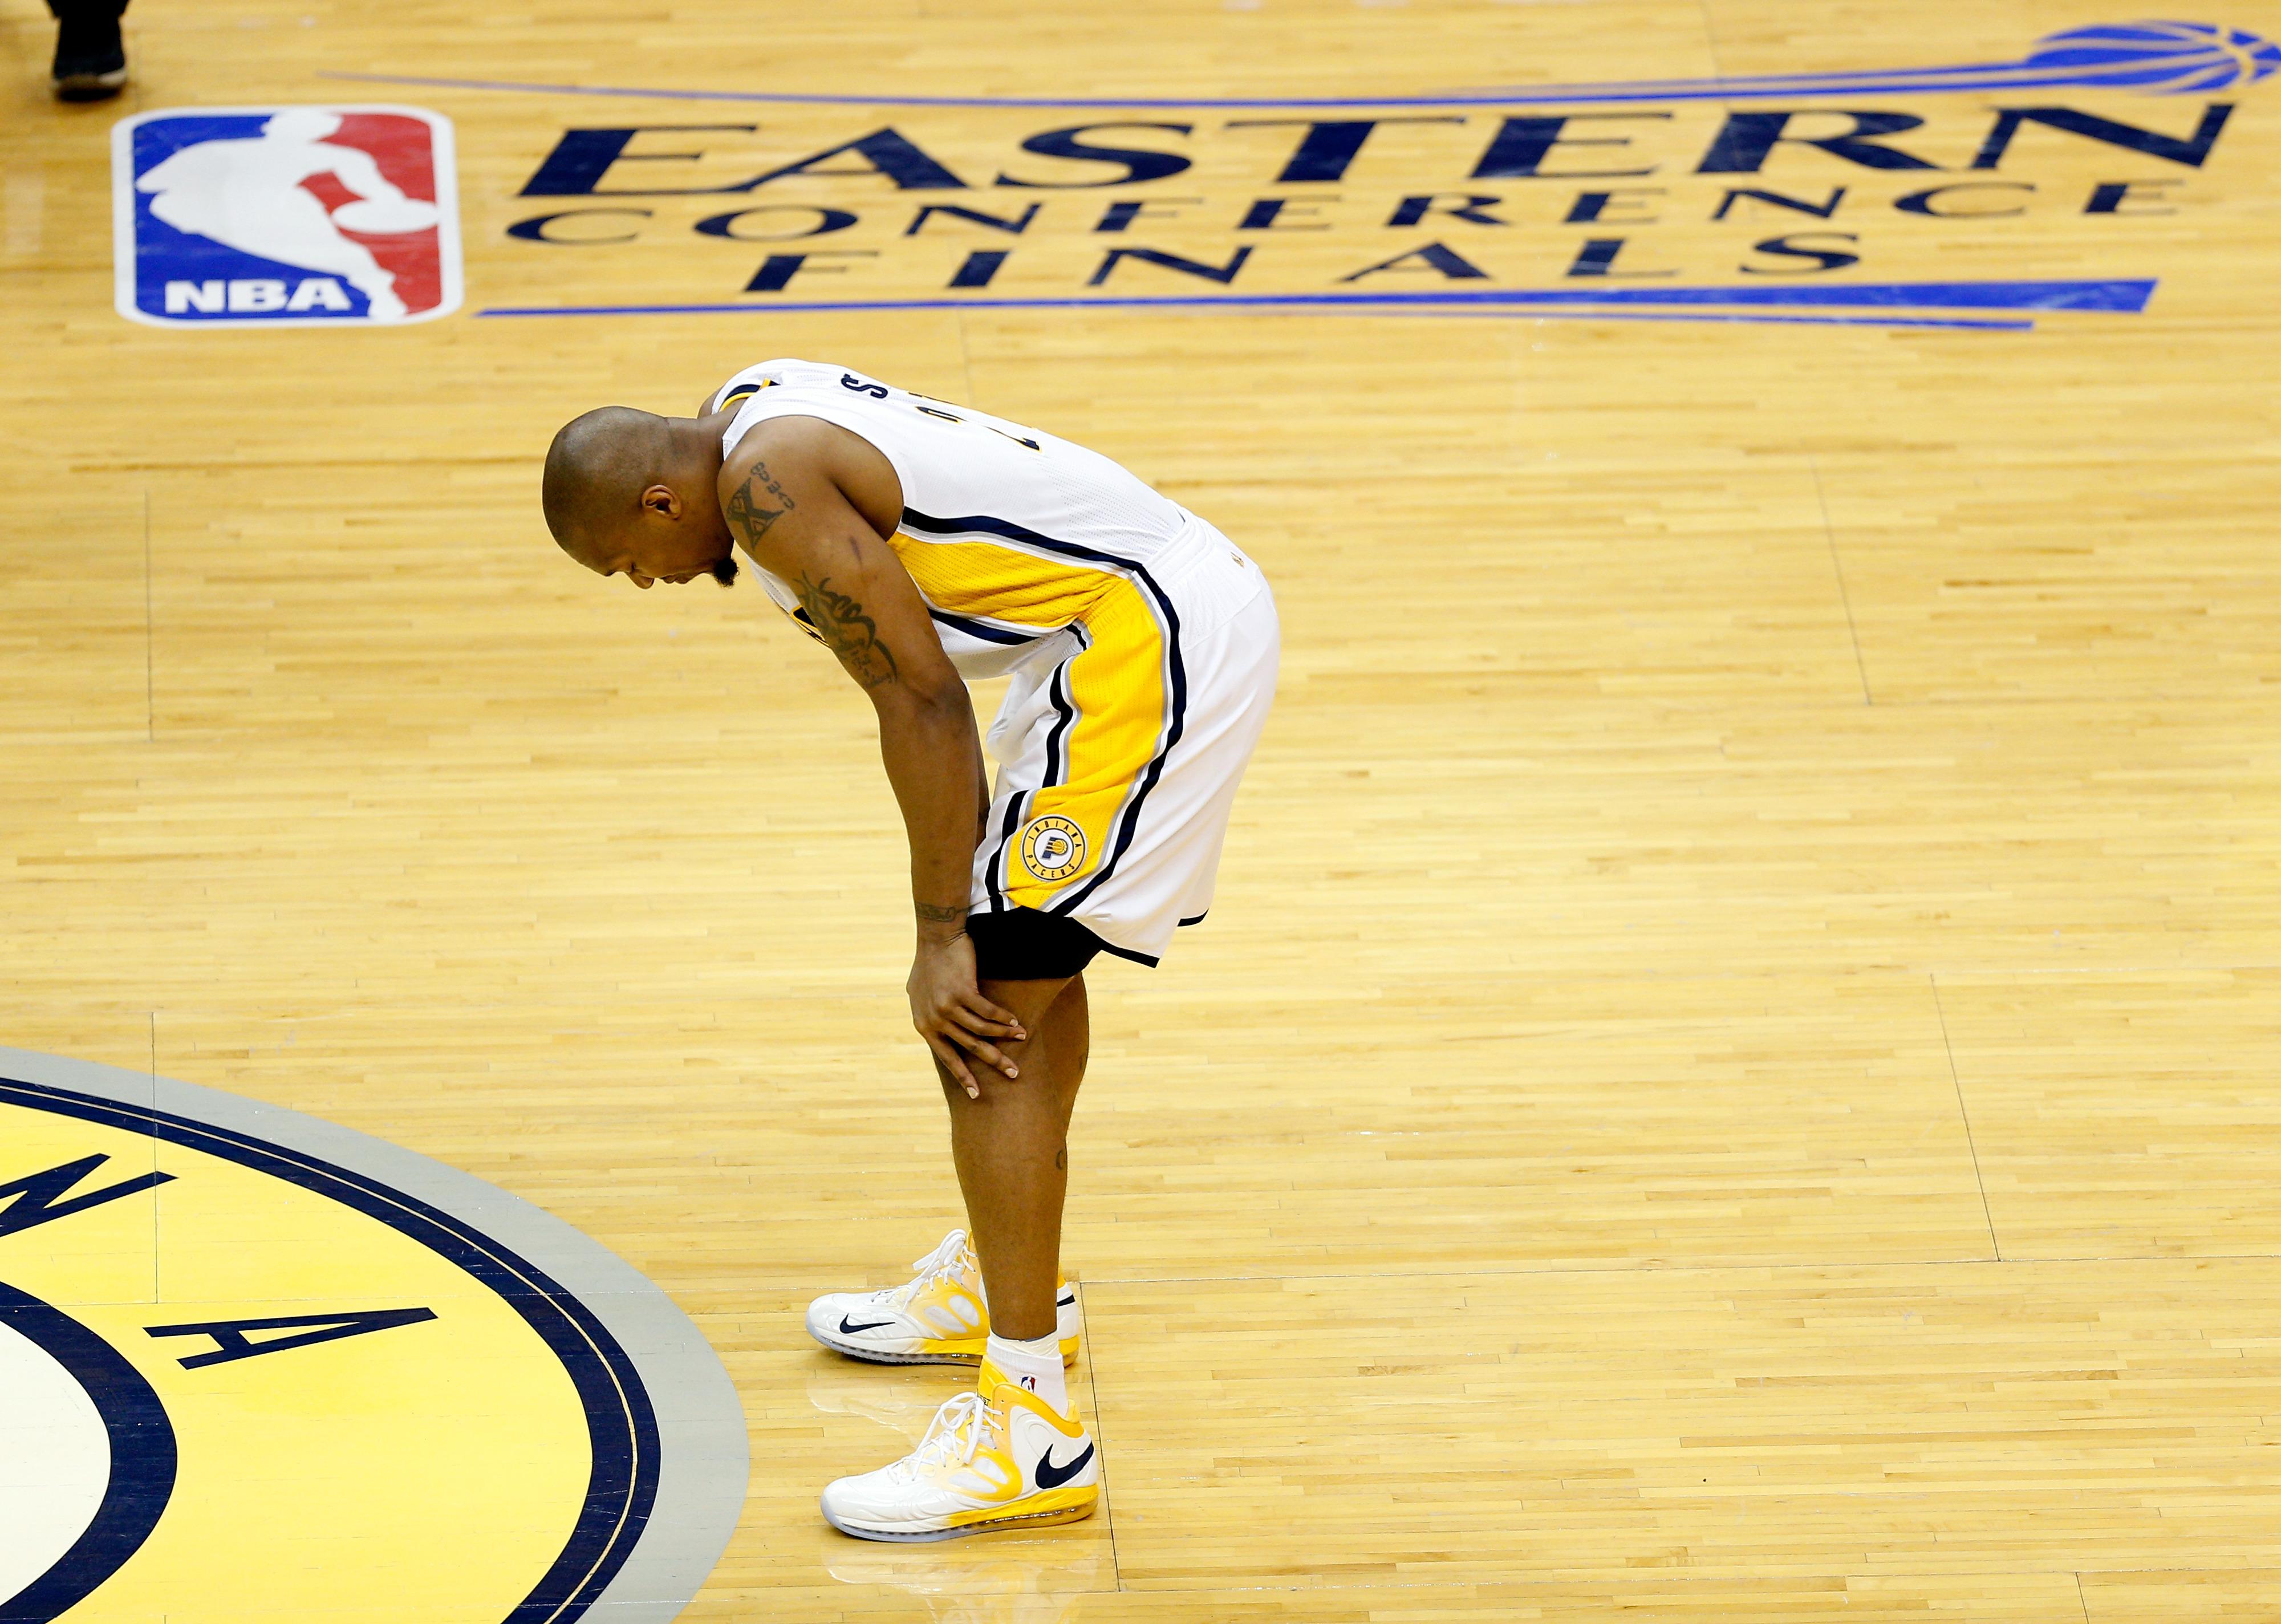 NBA Playoffs 2013, Heat vs. Pacers: David West comes through despite illness